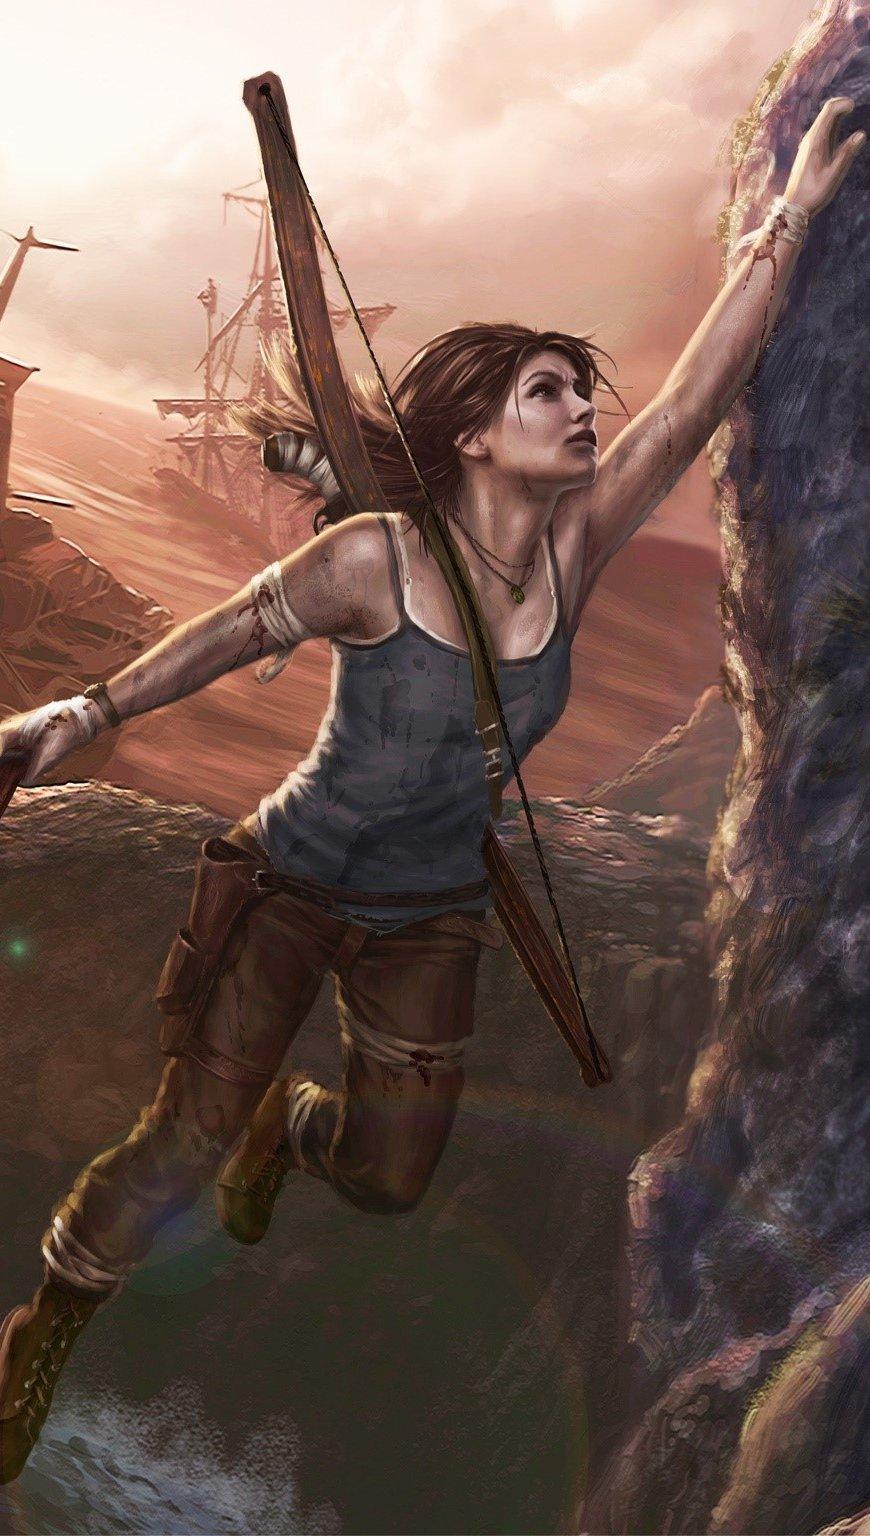 Fondos de pantalla Lara Croft art Vertical